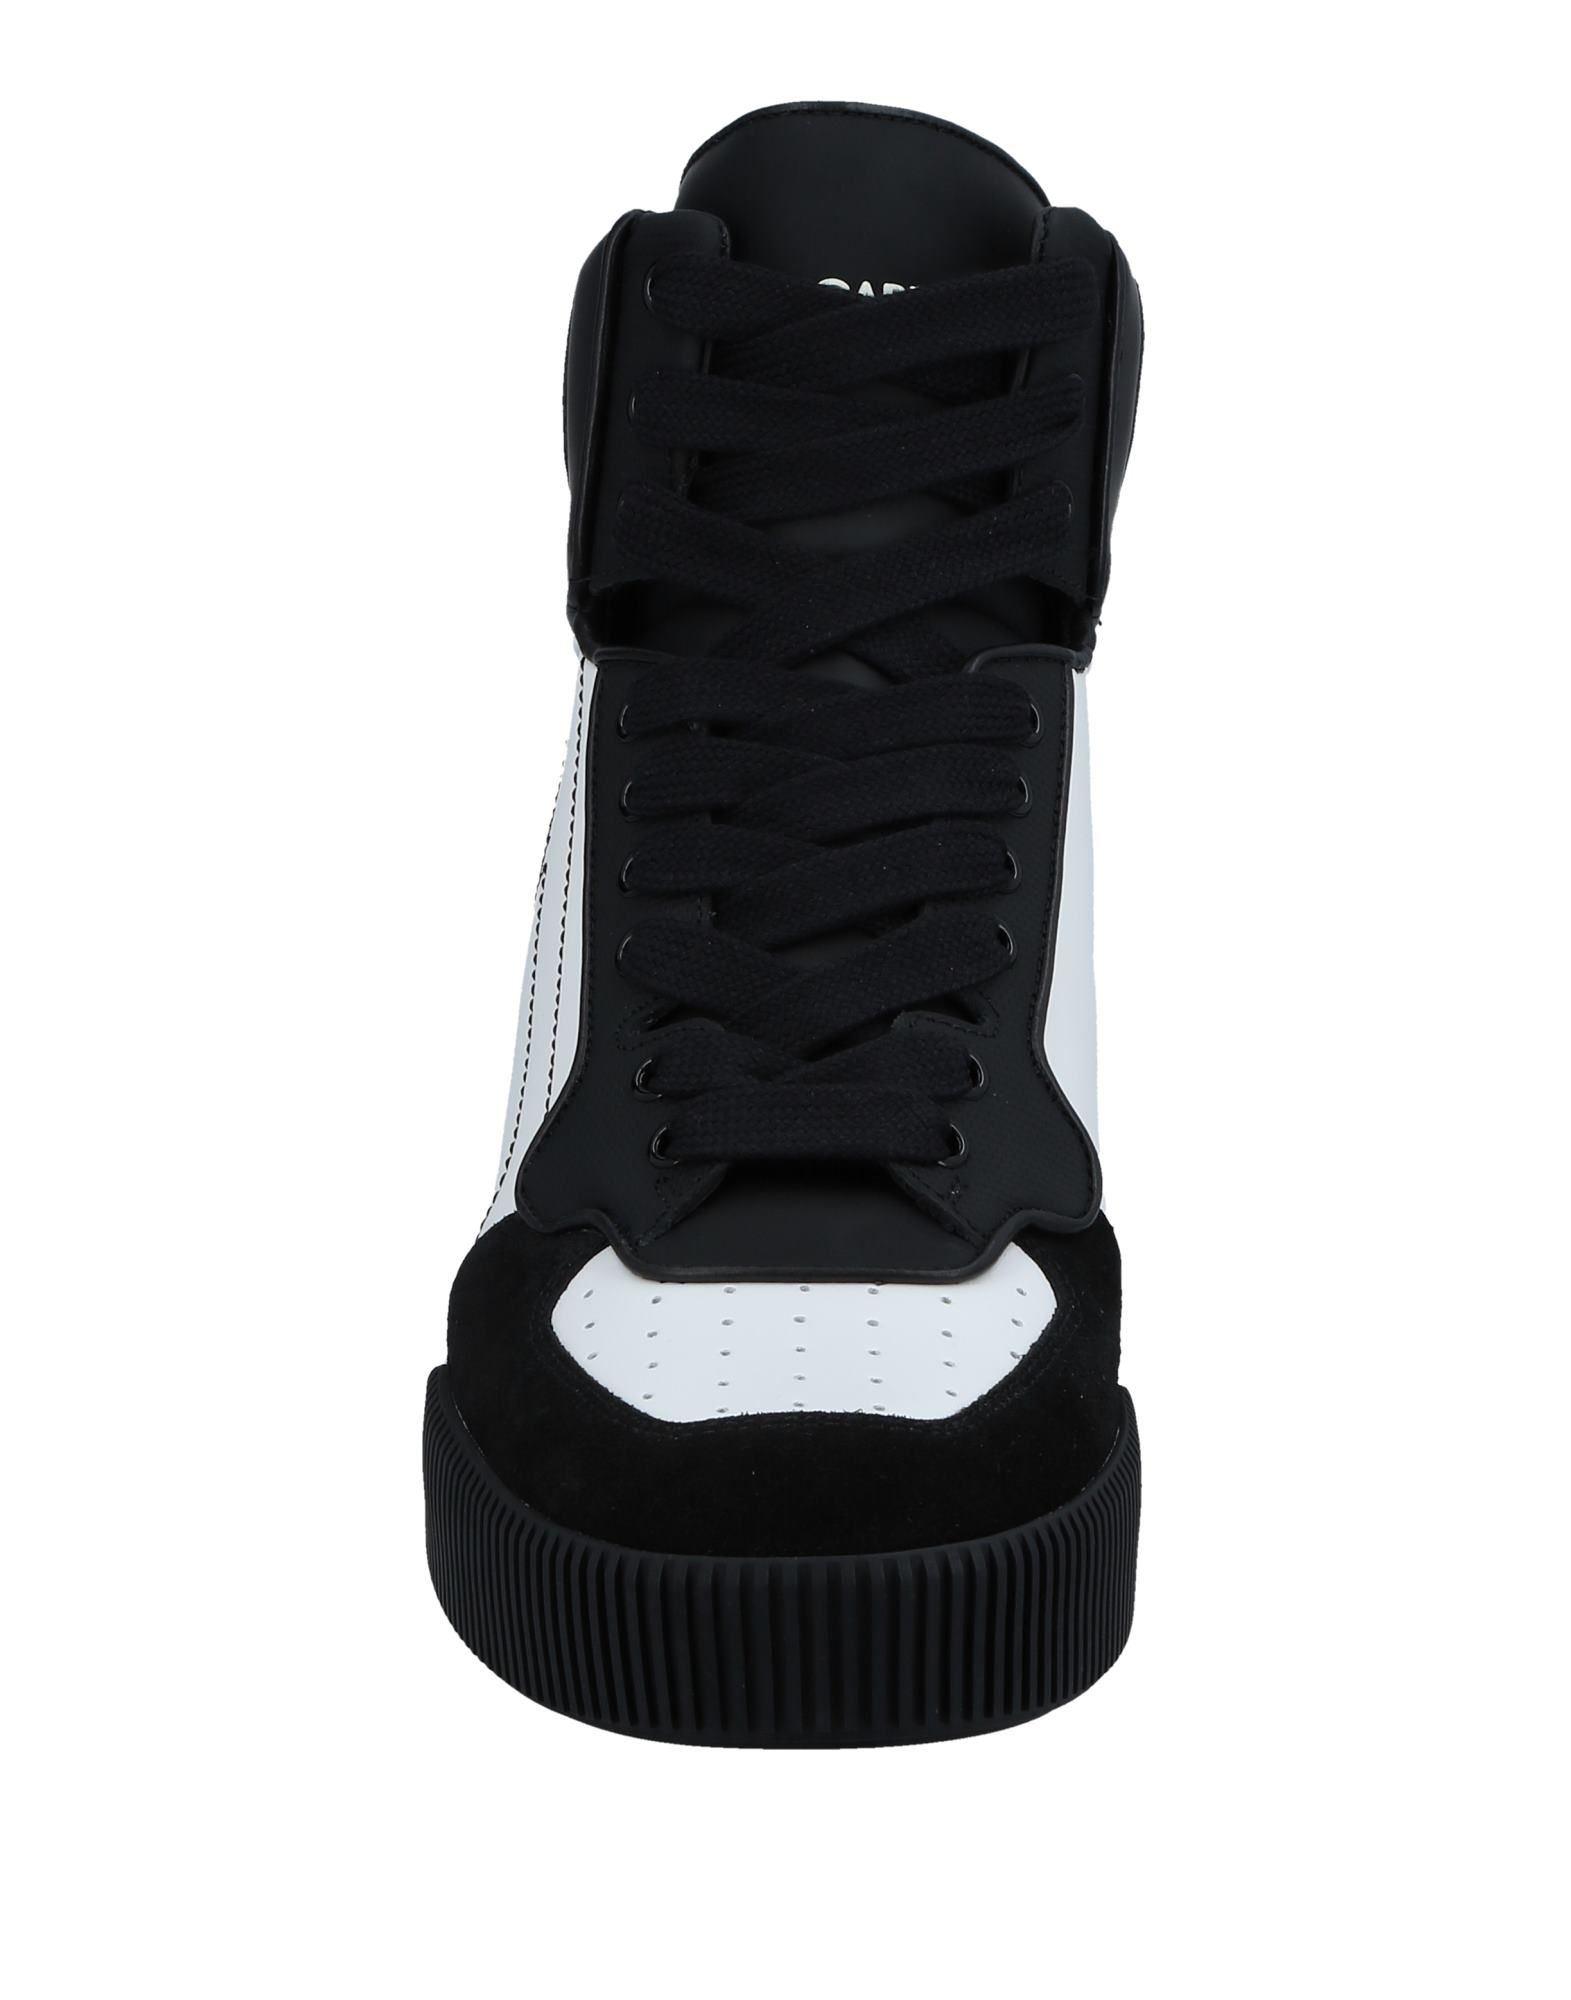 Dolce & Gabbana Sneakers Herren  11504625PQ Gute Qualität beliebte Schuhe Schuhe beliebte add0cd